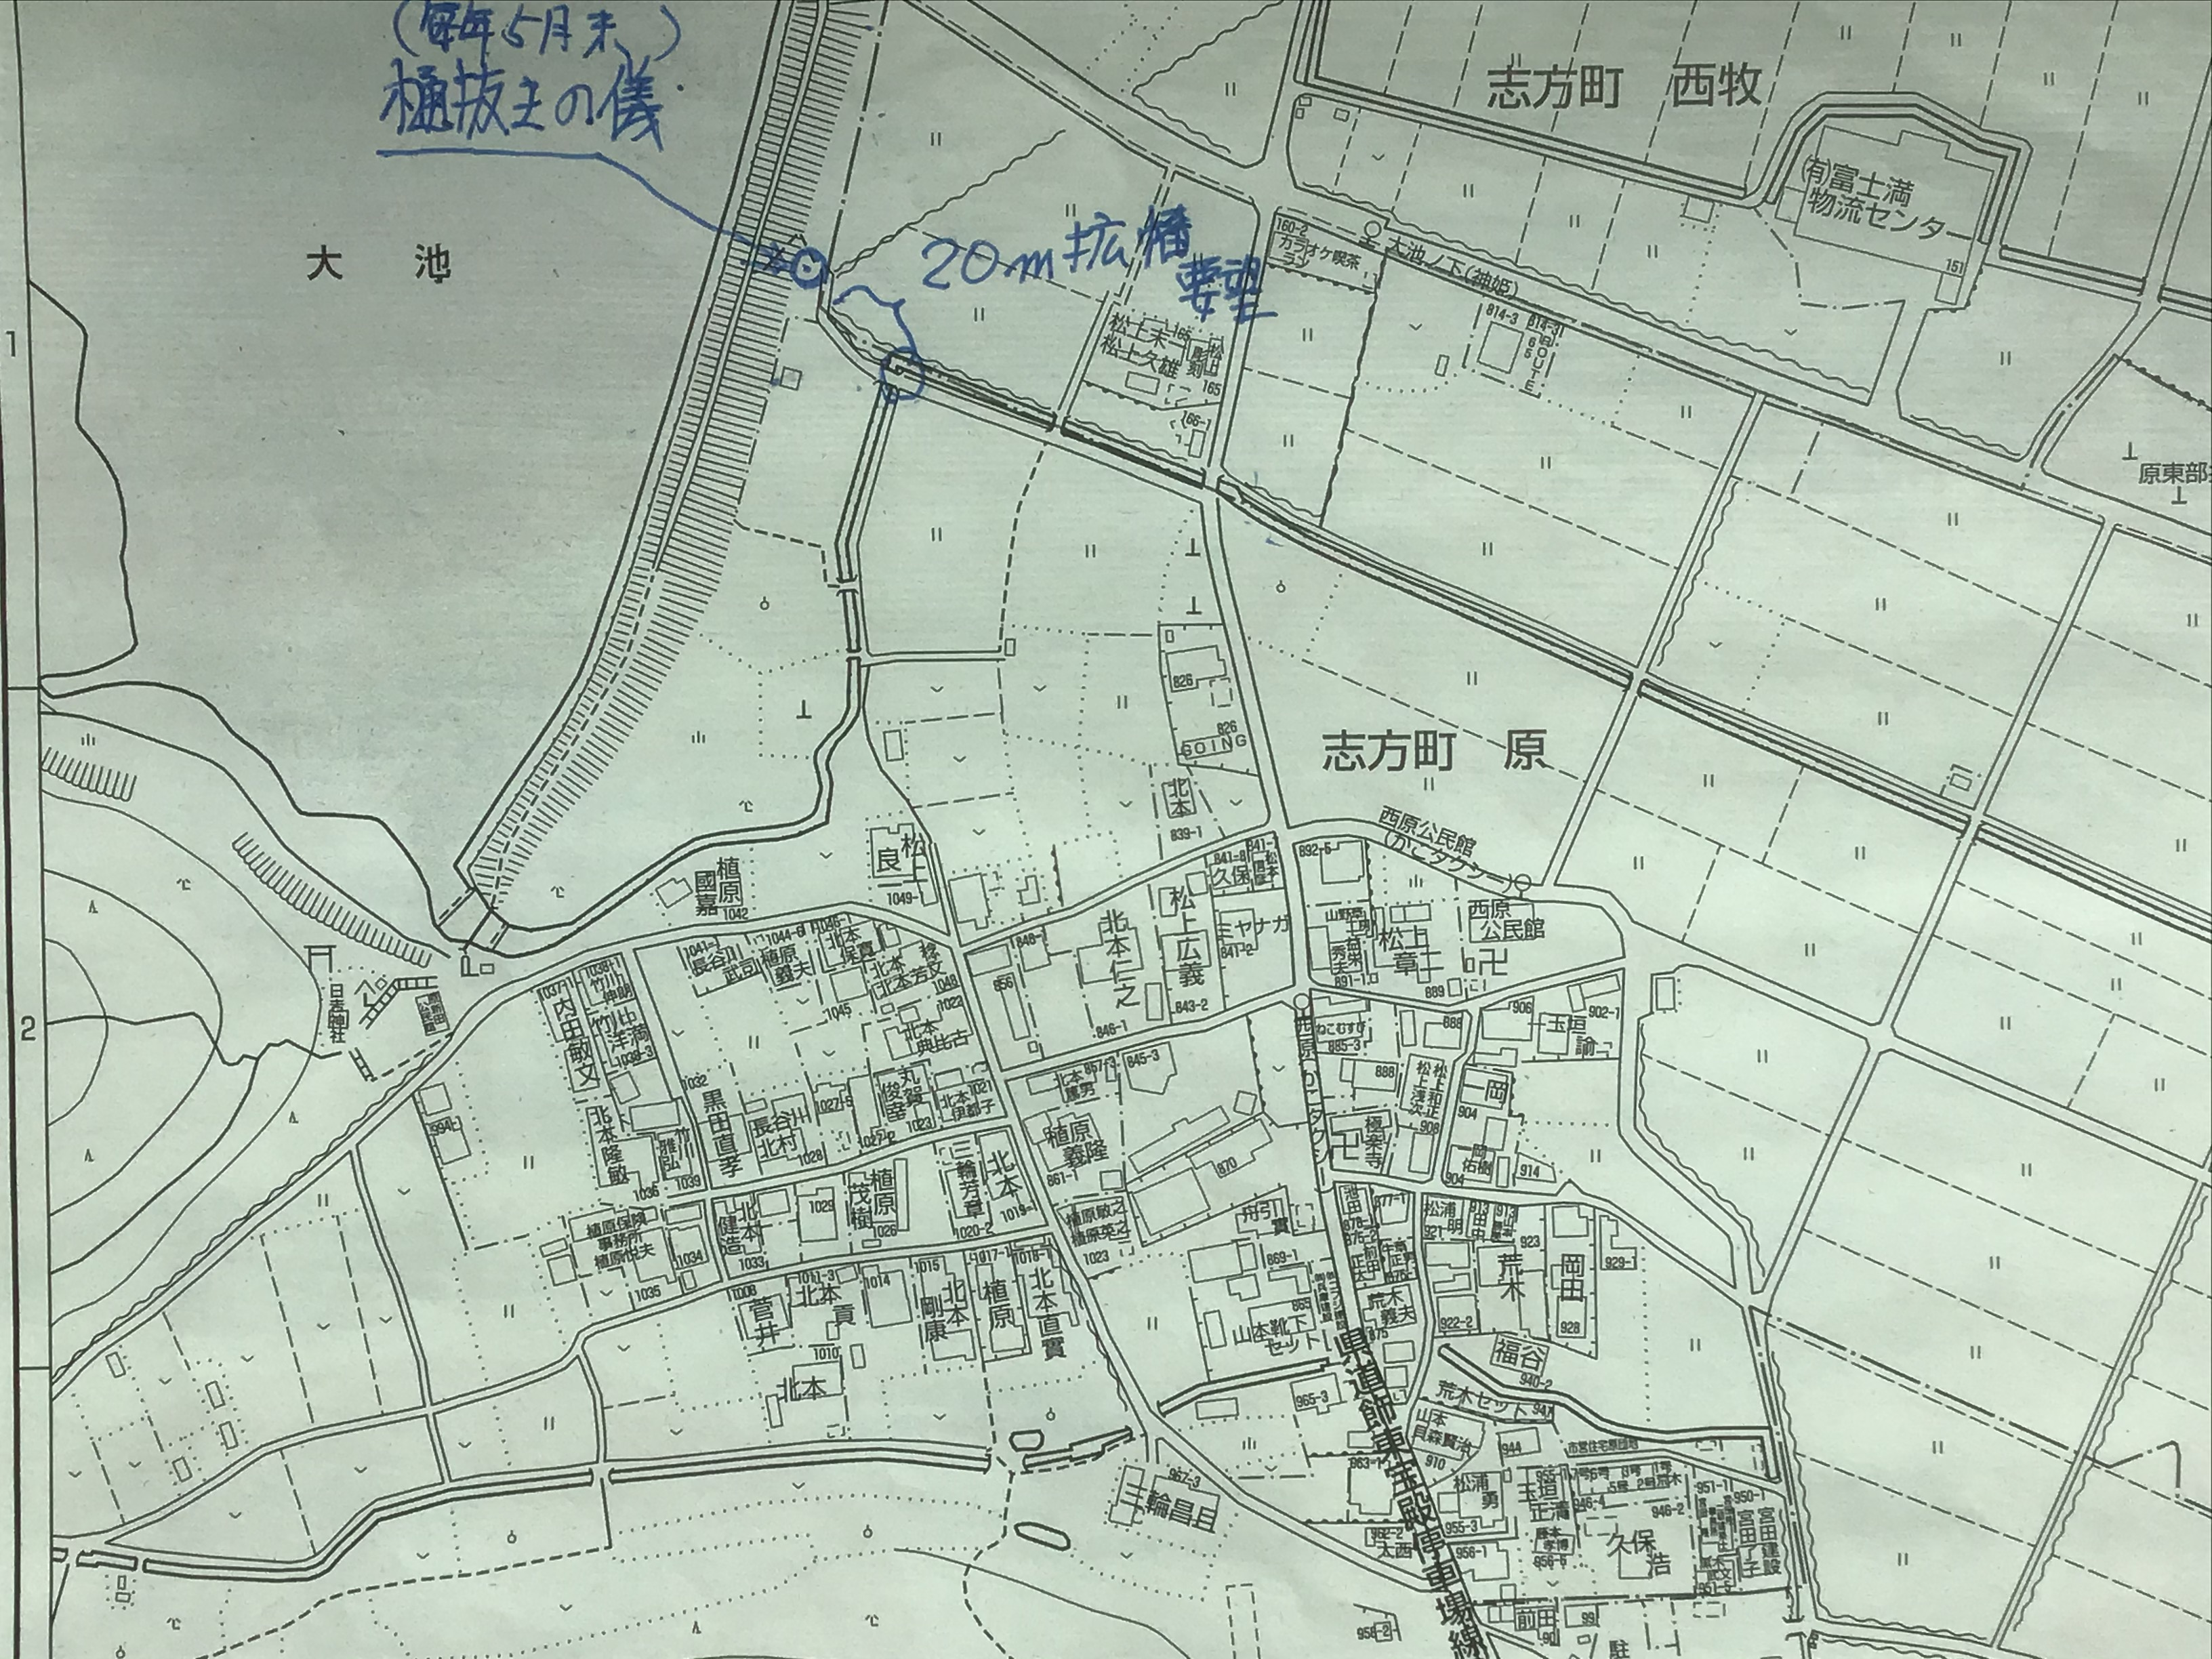 水路20m拡幅要望箇所(加古川市住宅地図より)